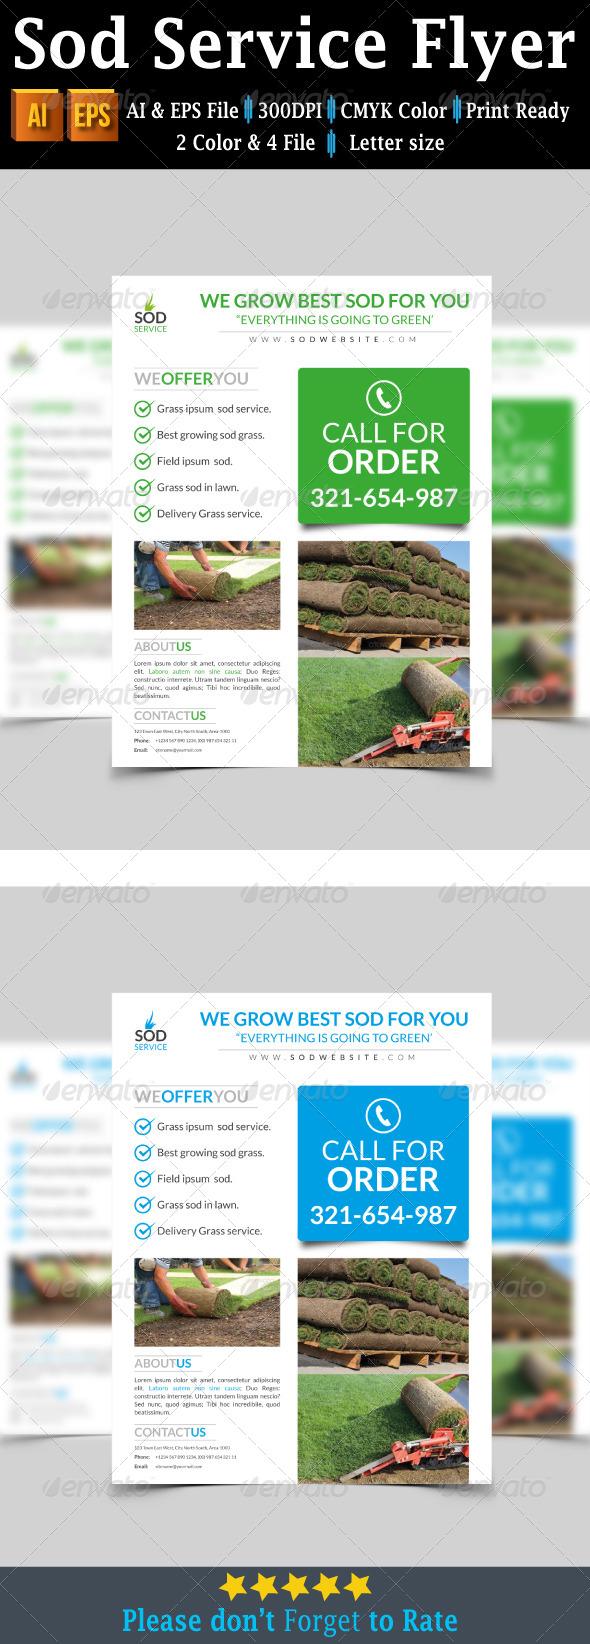 GraphicRiver Sod Service Flyer 7827690